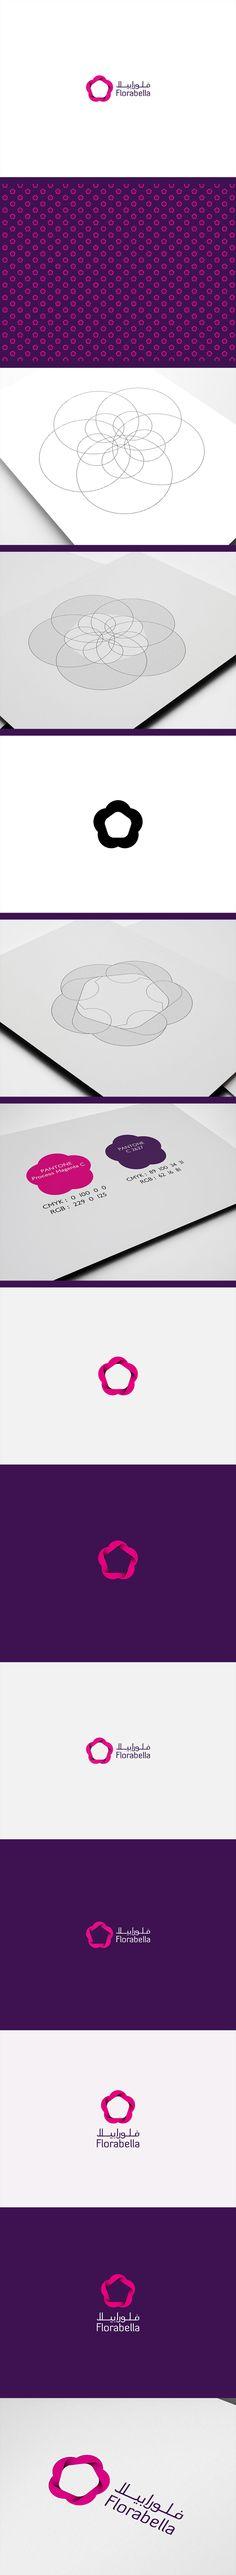 Florabella Identity // Branding by Mohd Almousa, via Behance